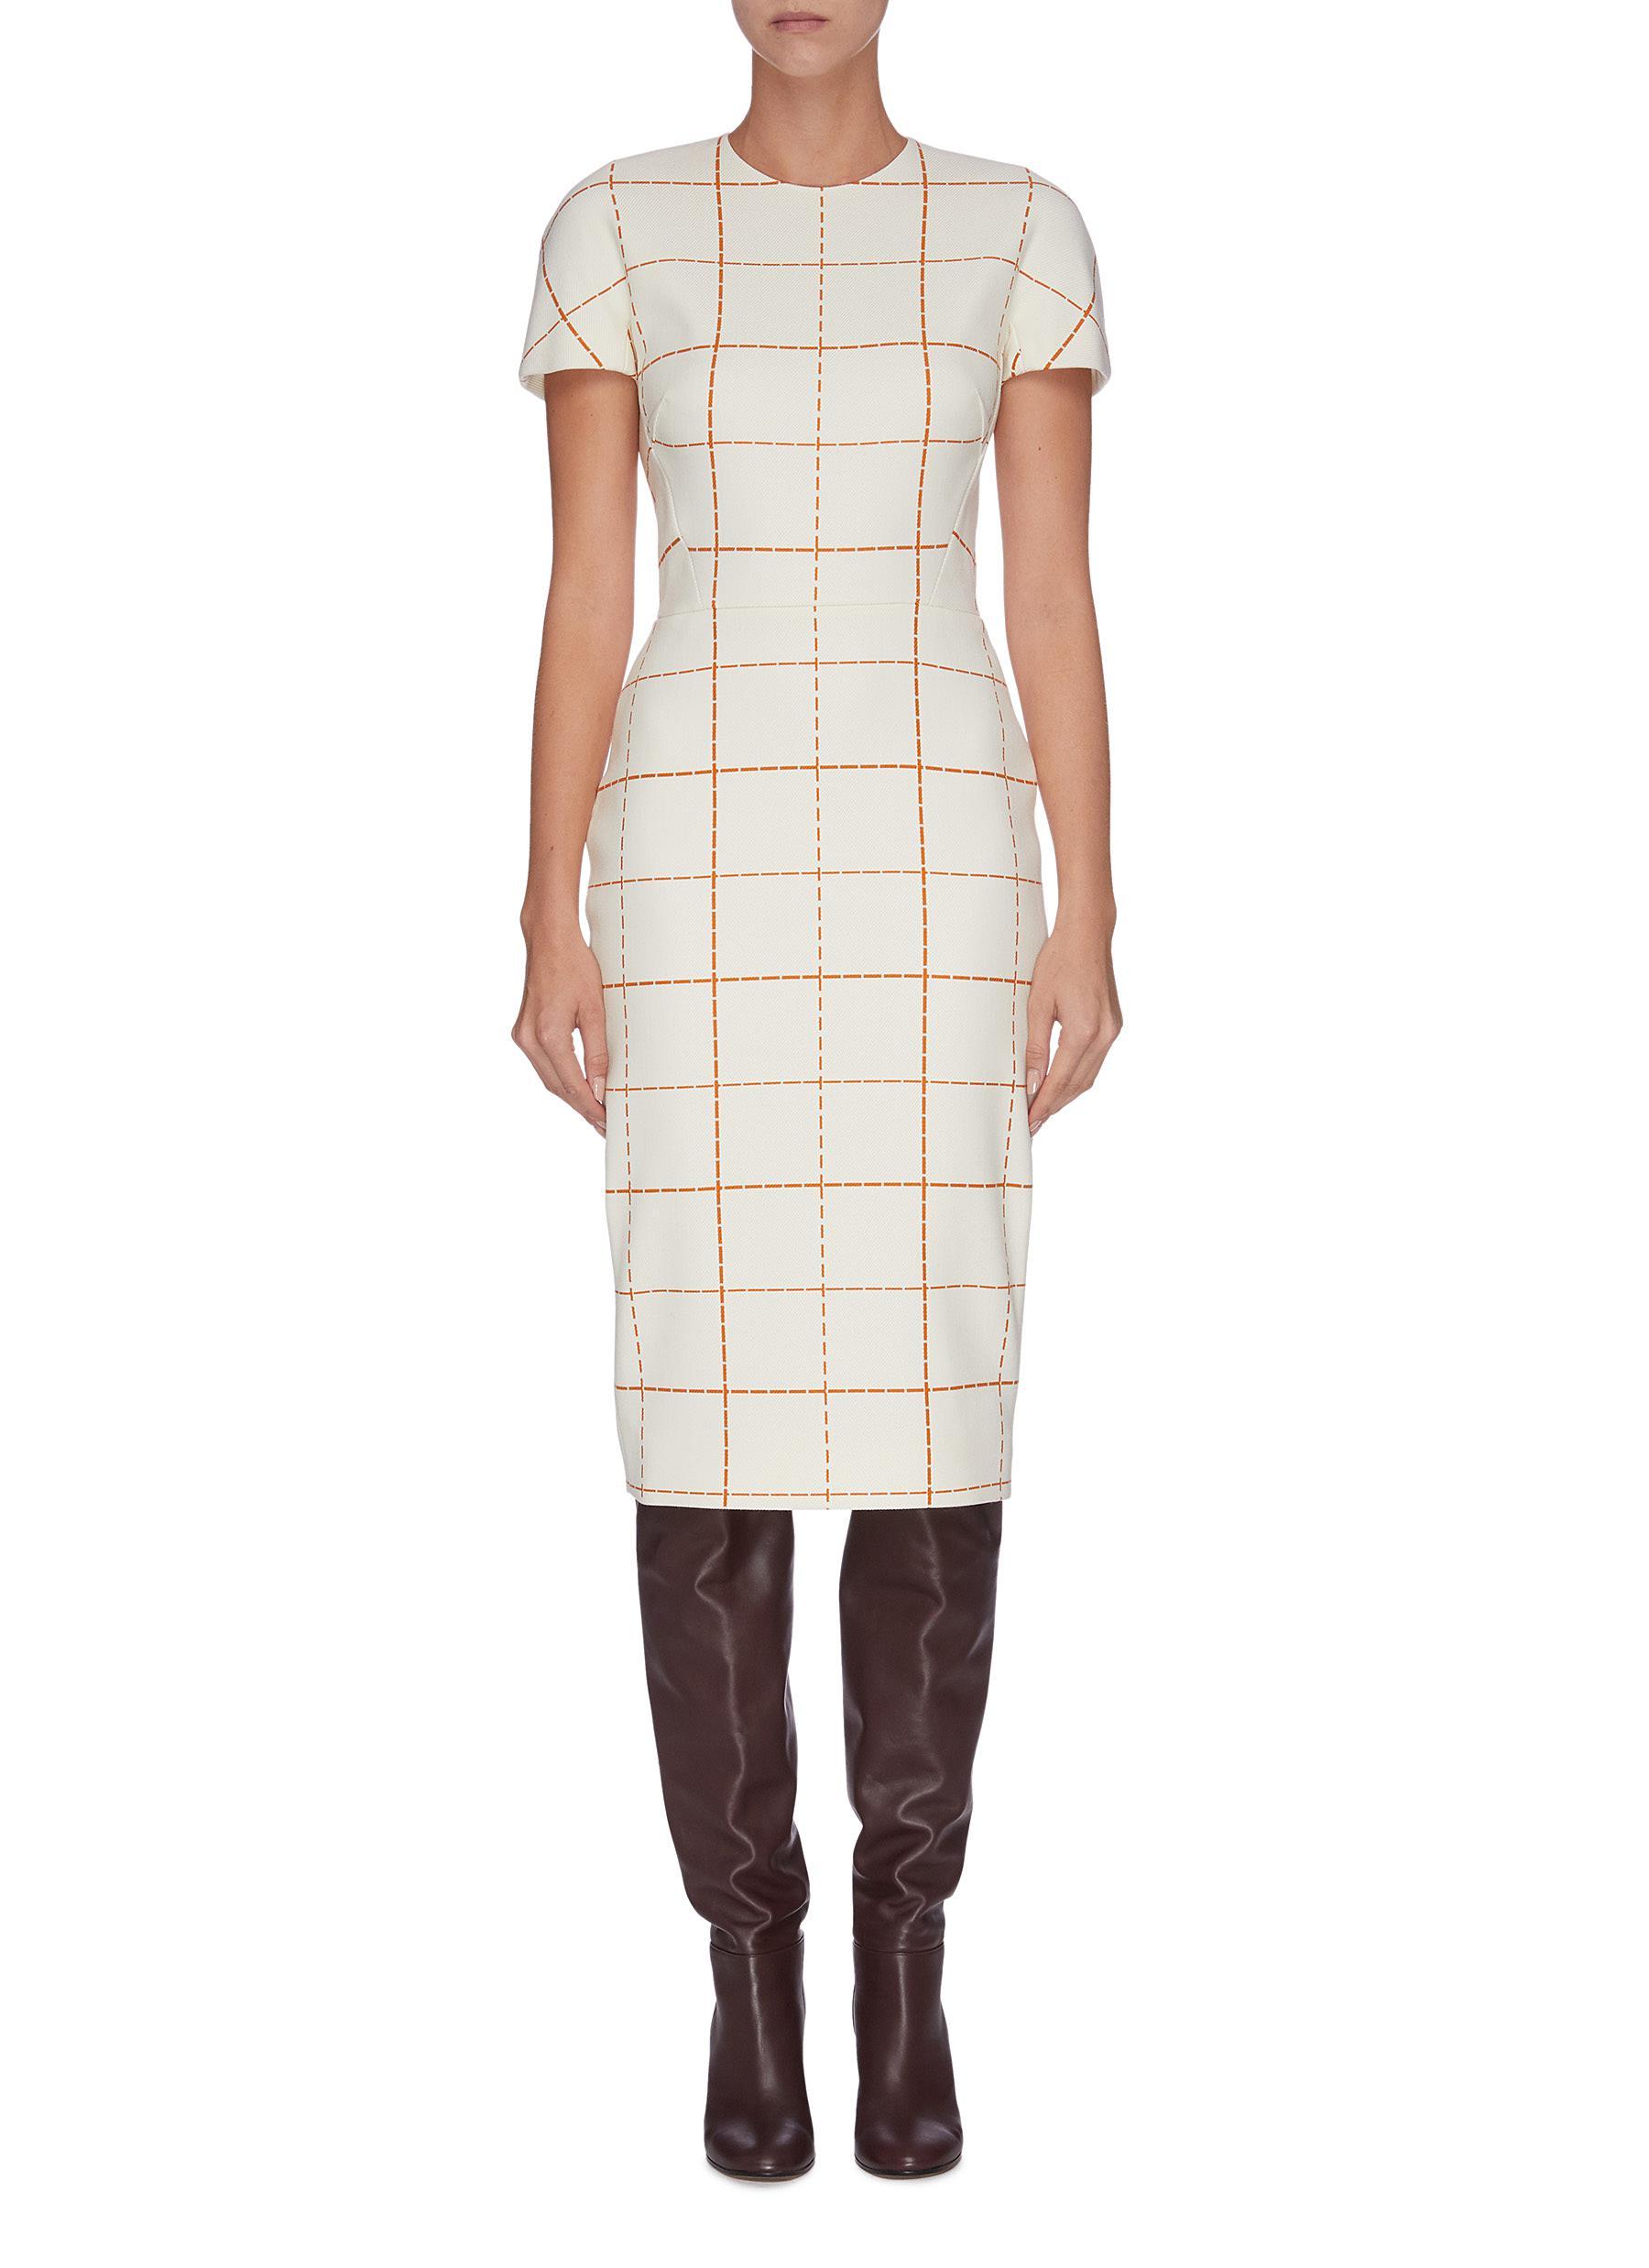 Grid print midi dress by Victoria Beckham